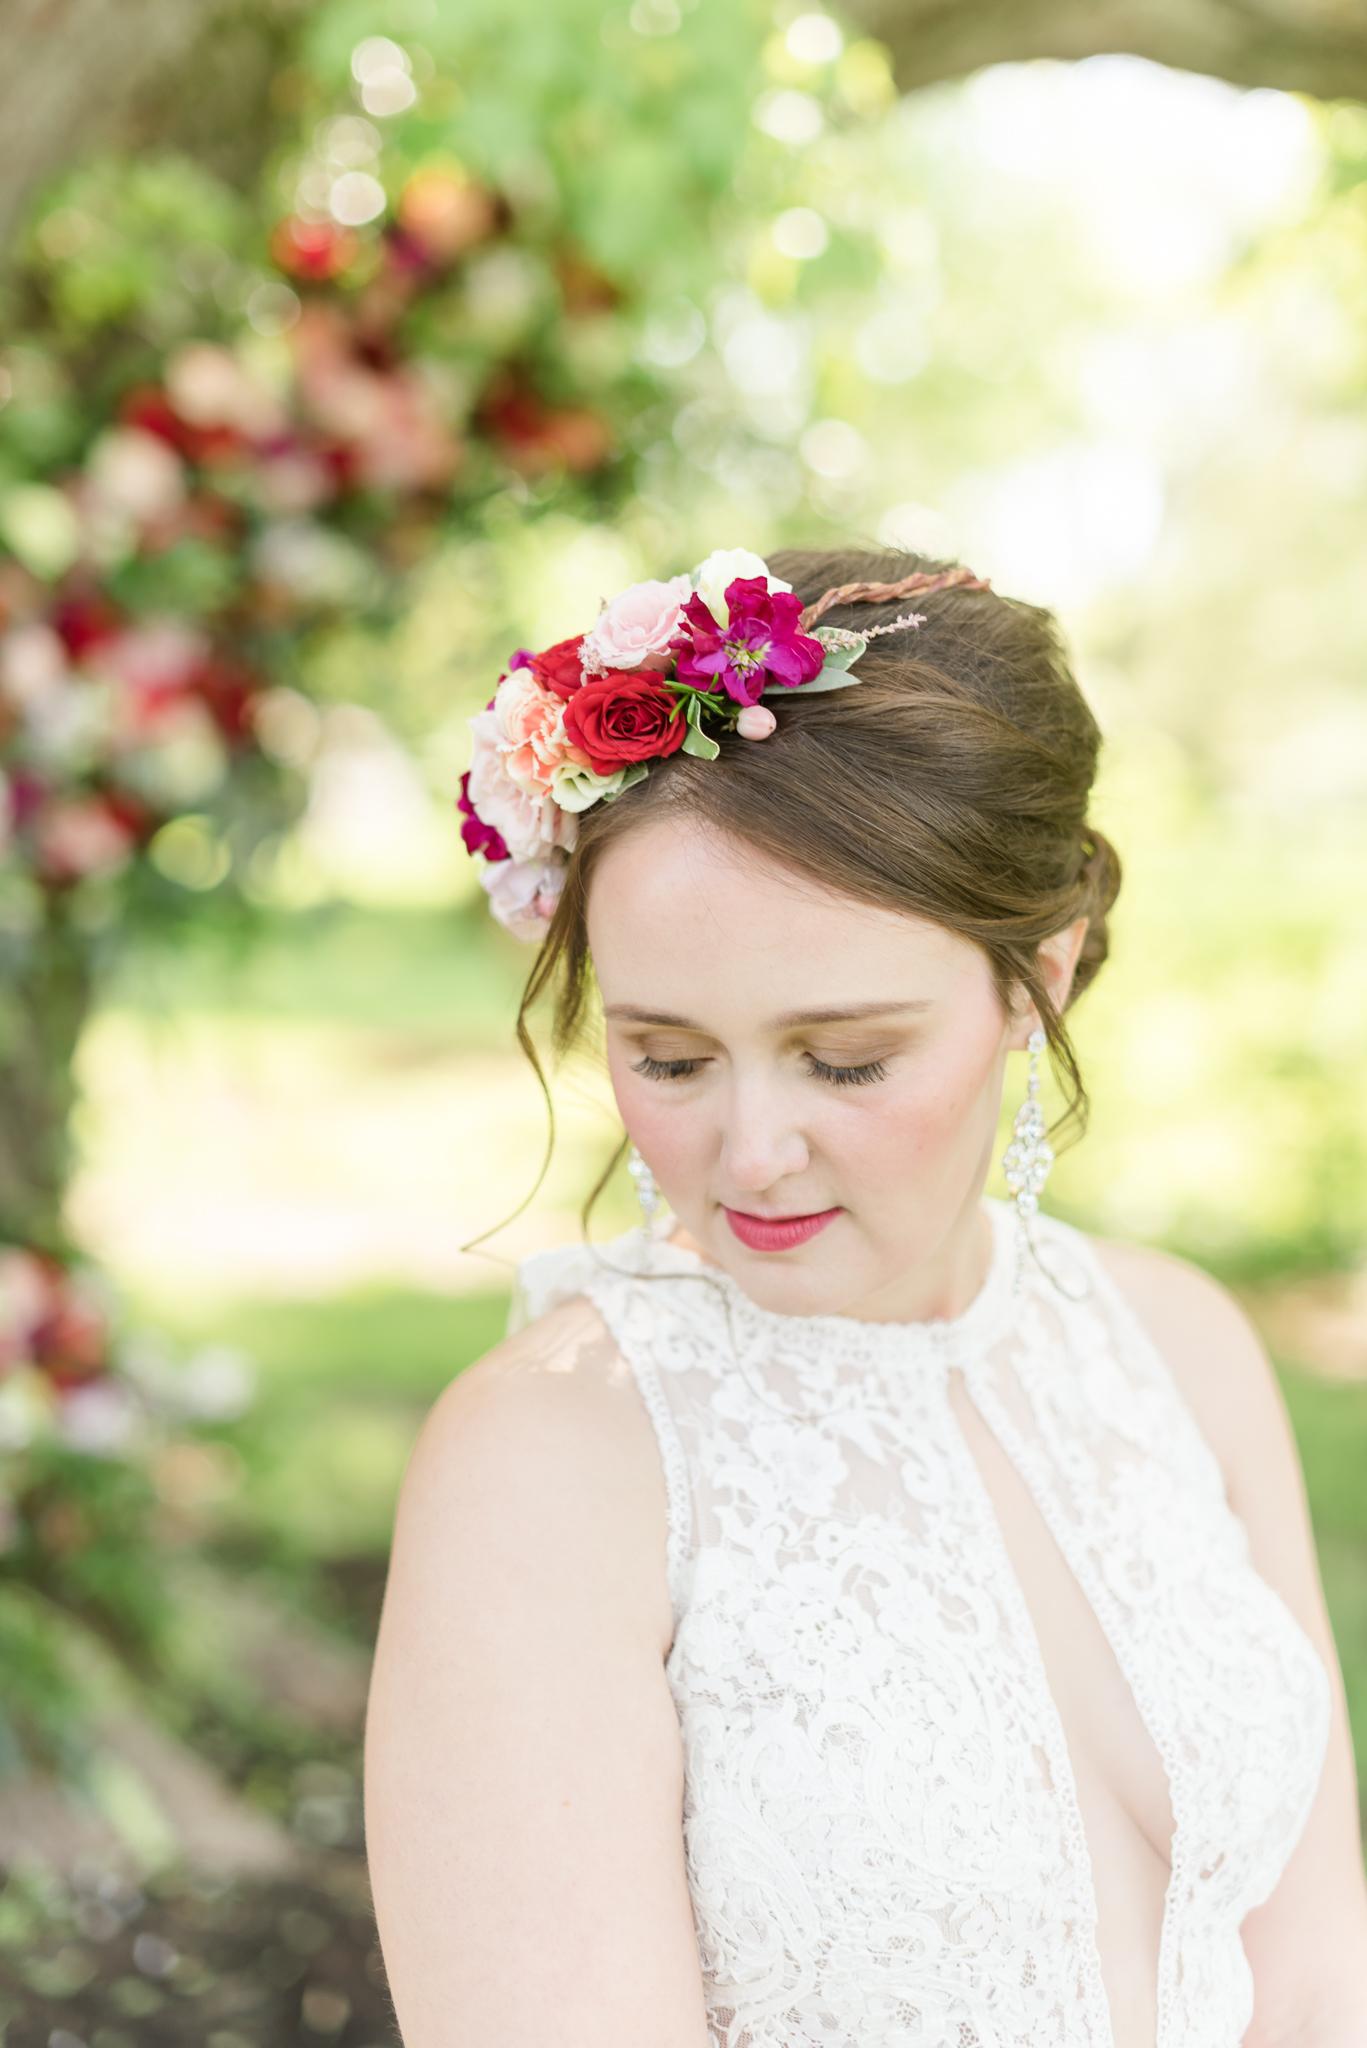 Mustard Seed Gardens Wedding Indianapolis Noblesvile Fishers Wedding Photographer-35.jpg